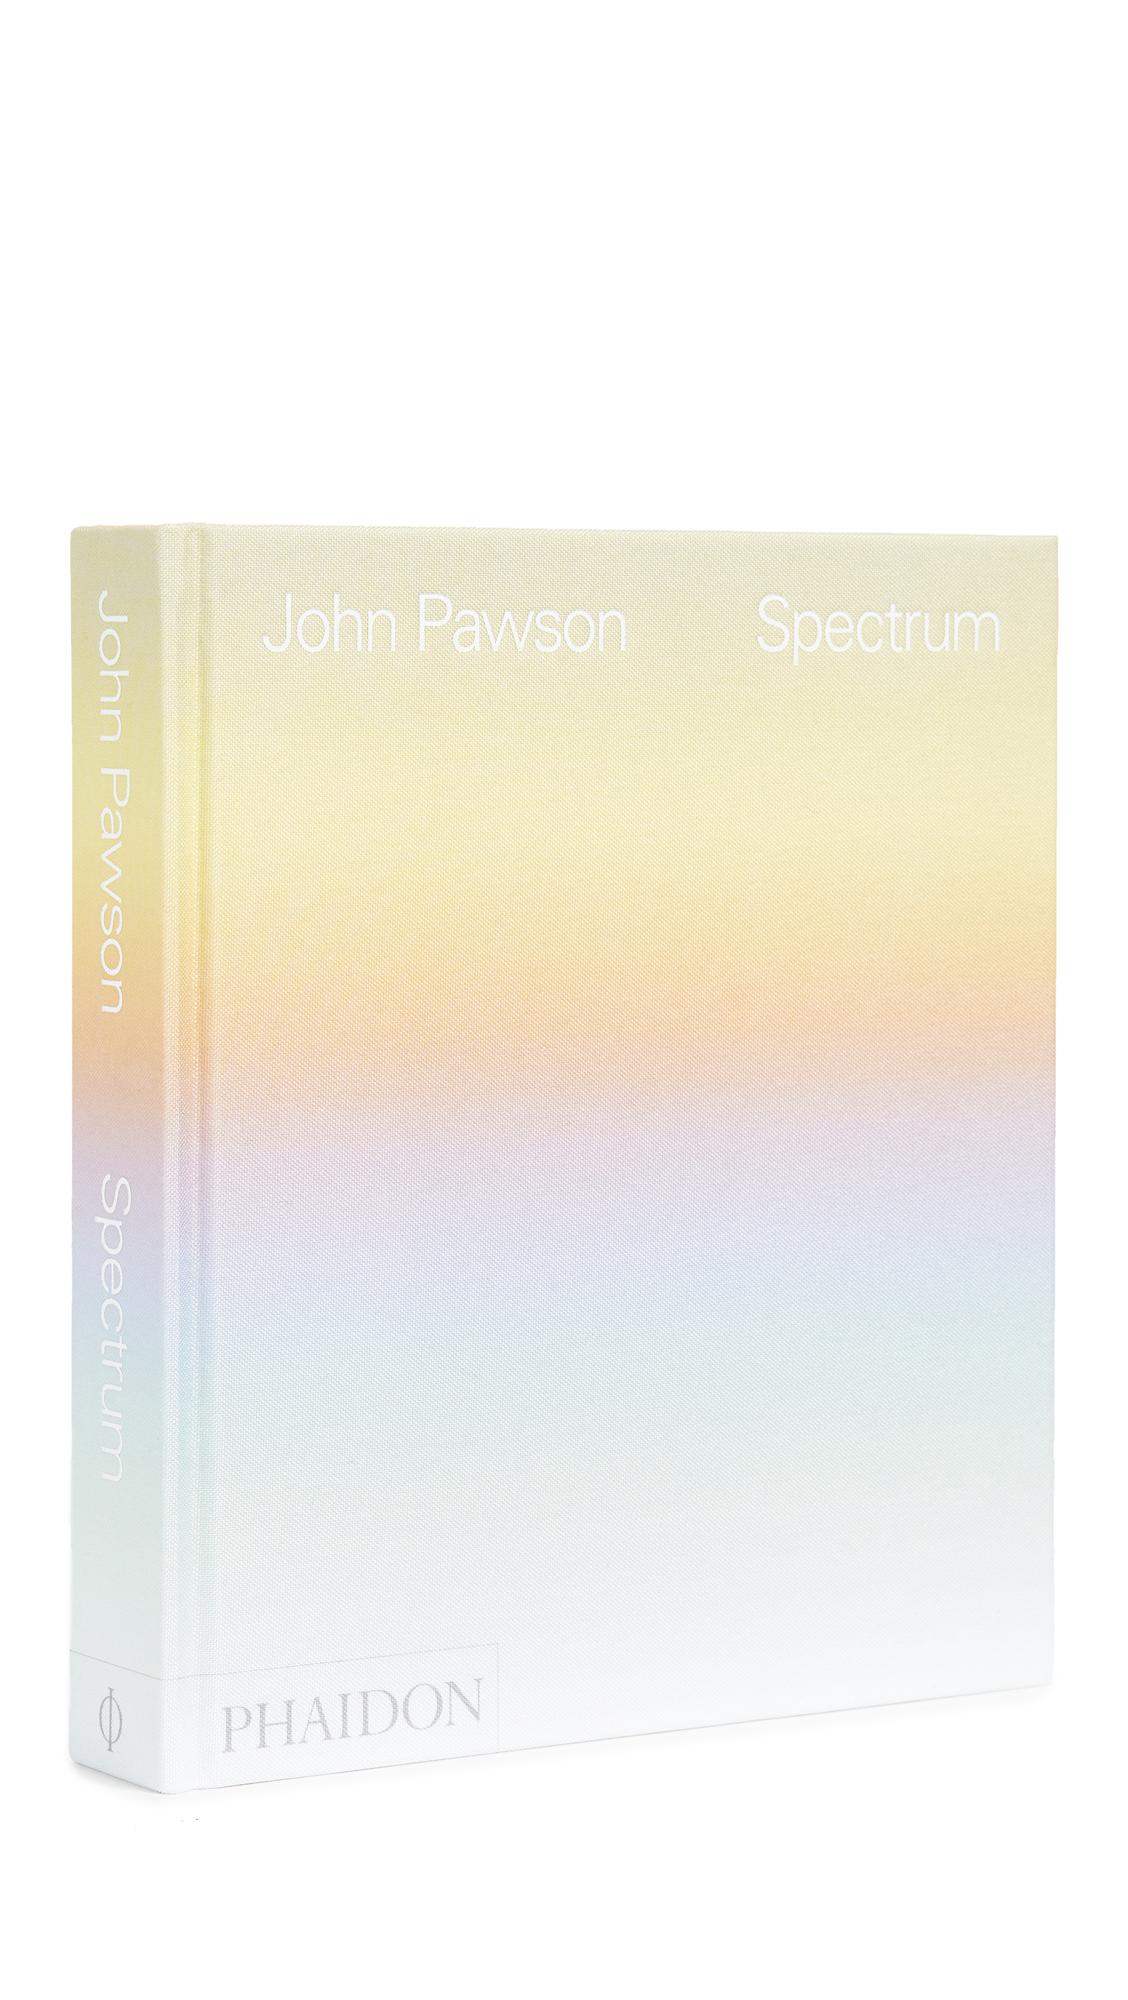 Phaidon Spectrum